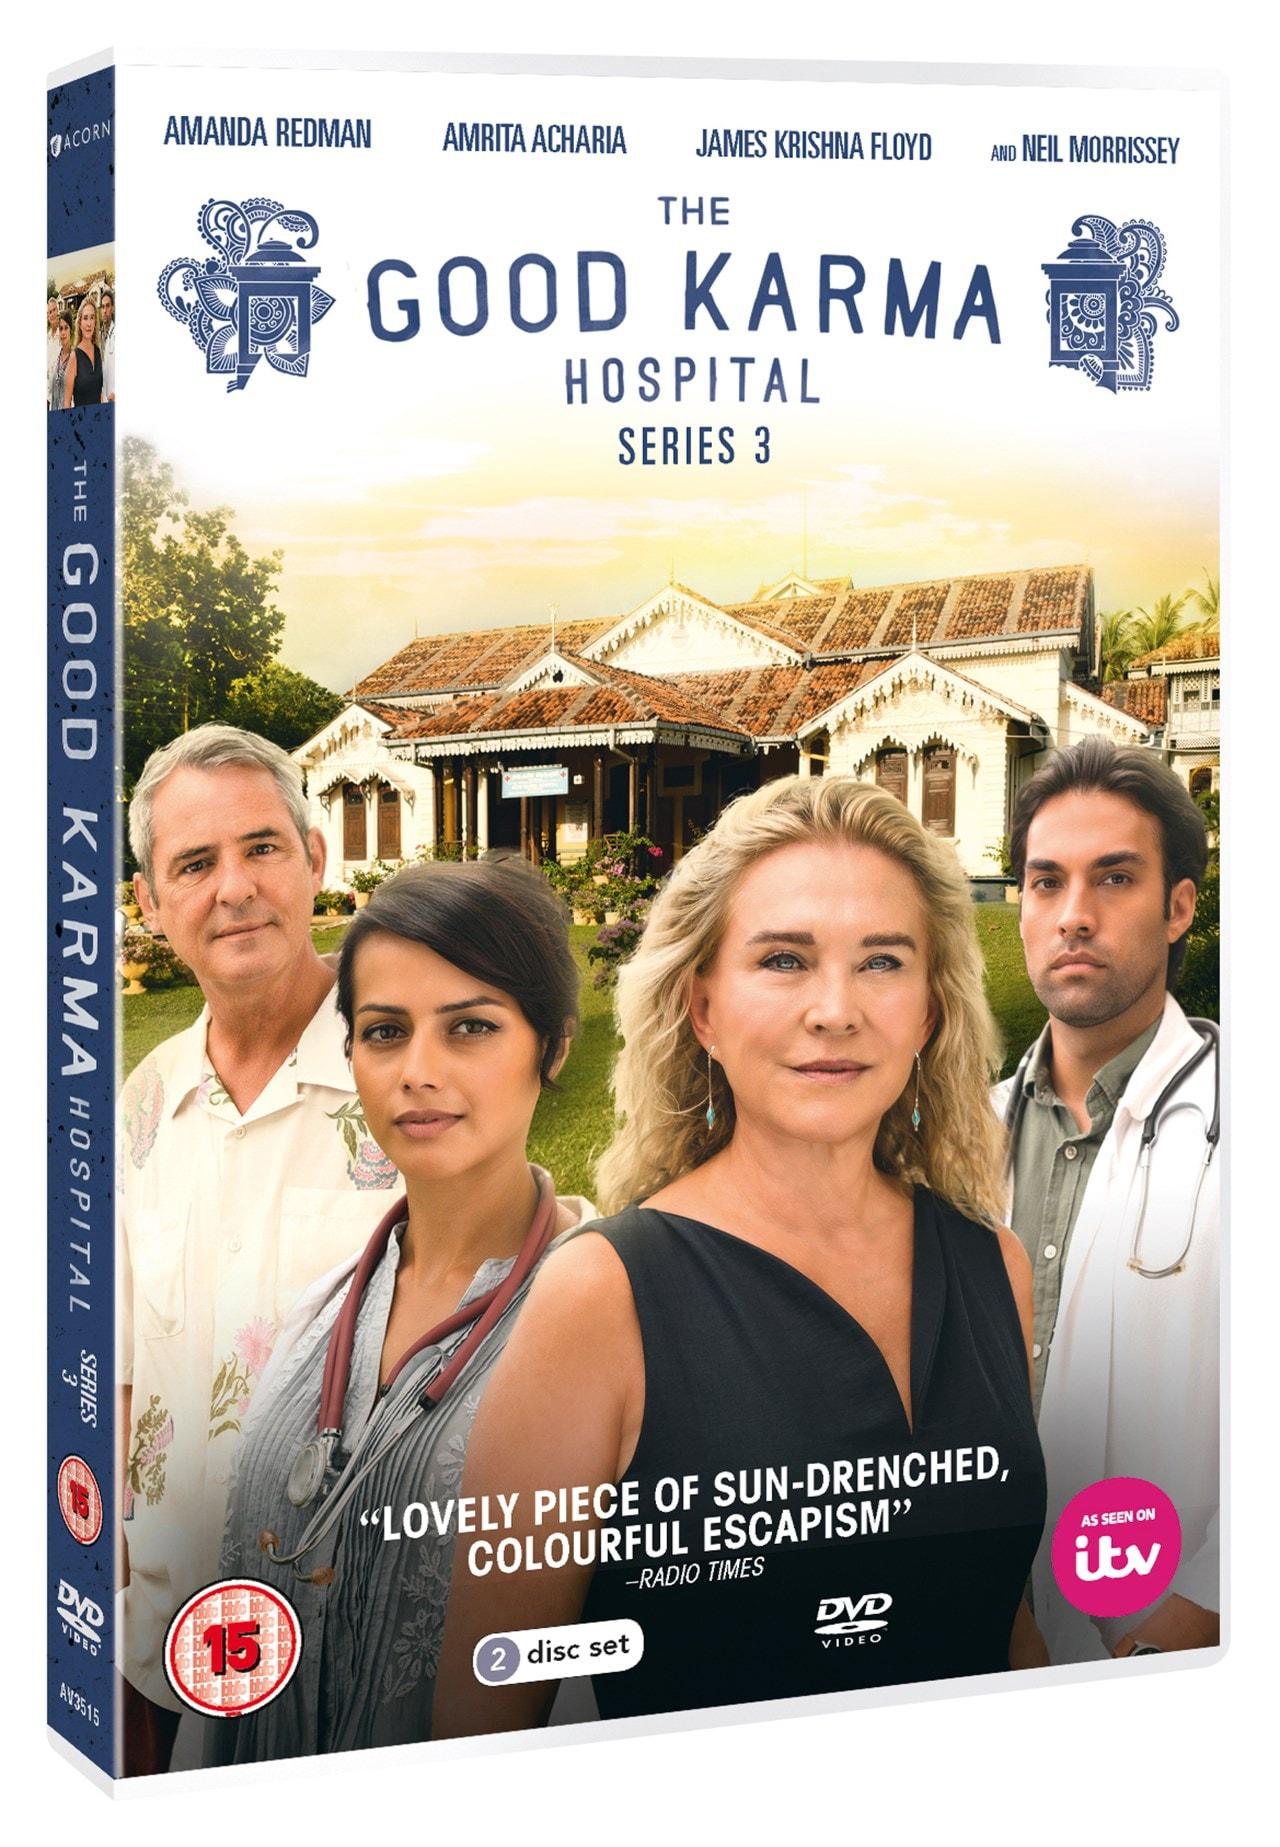 The Good Karma Hospital: Series 3 - 2